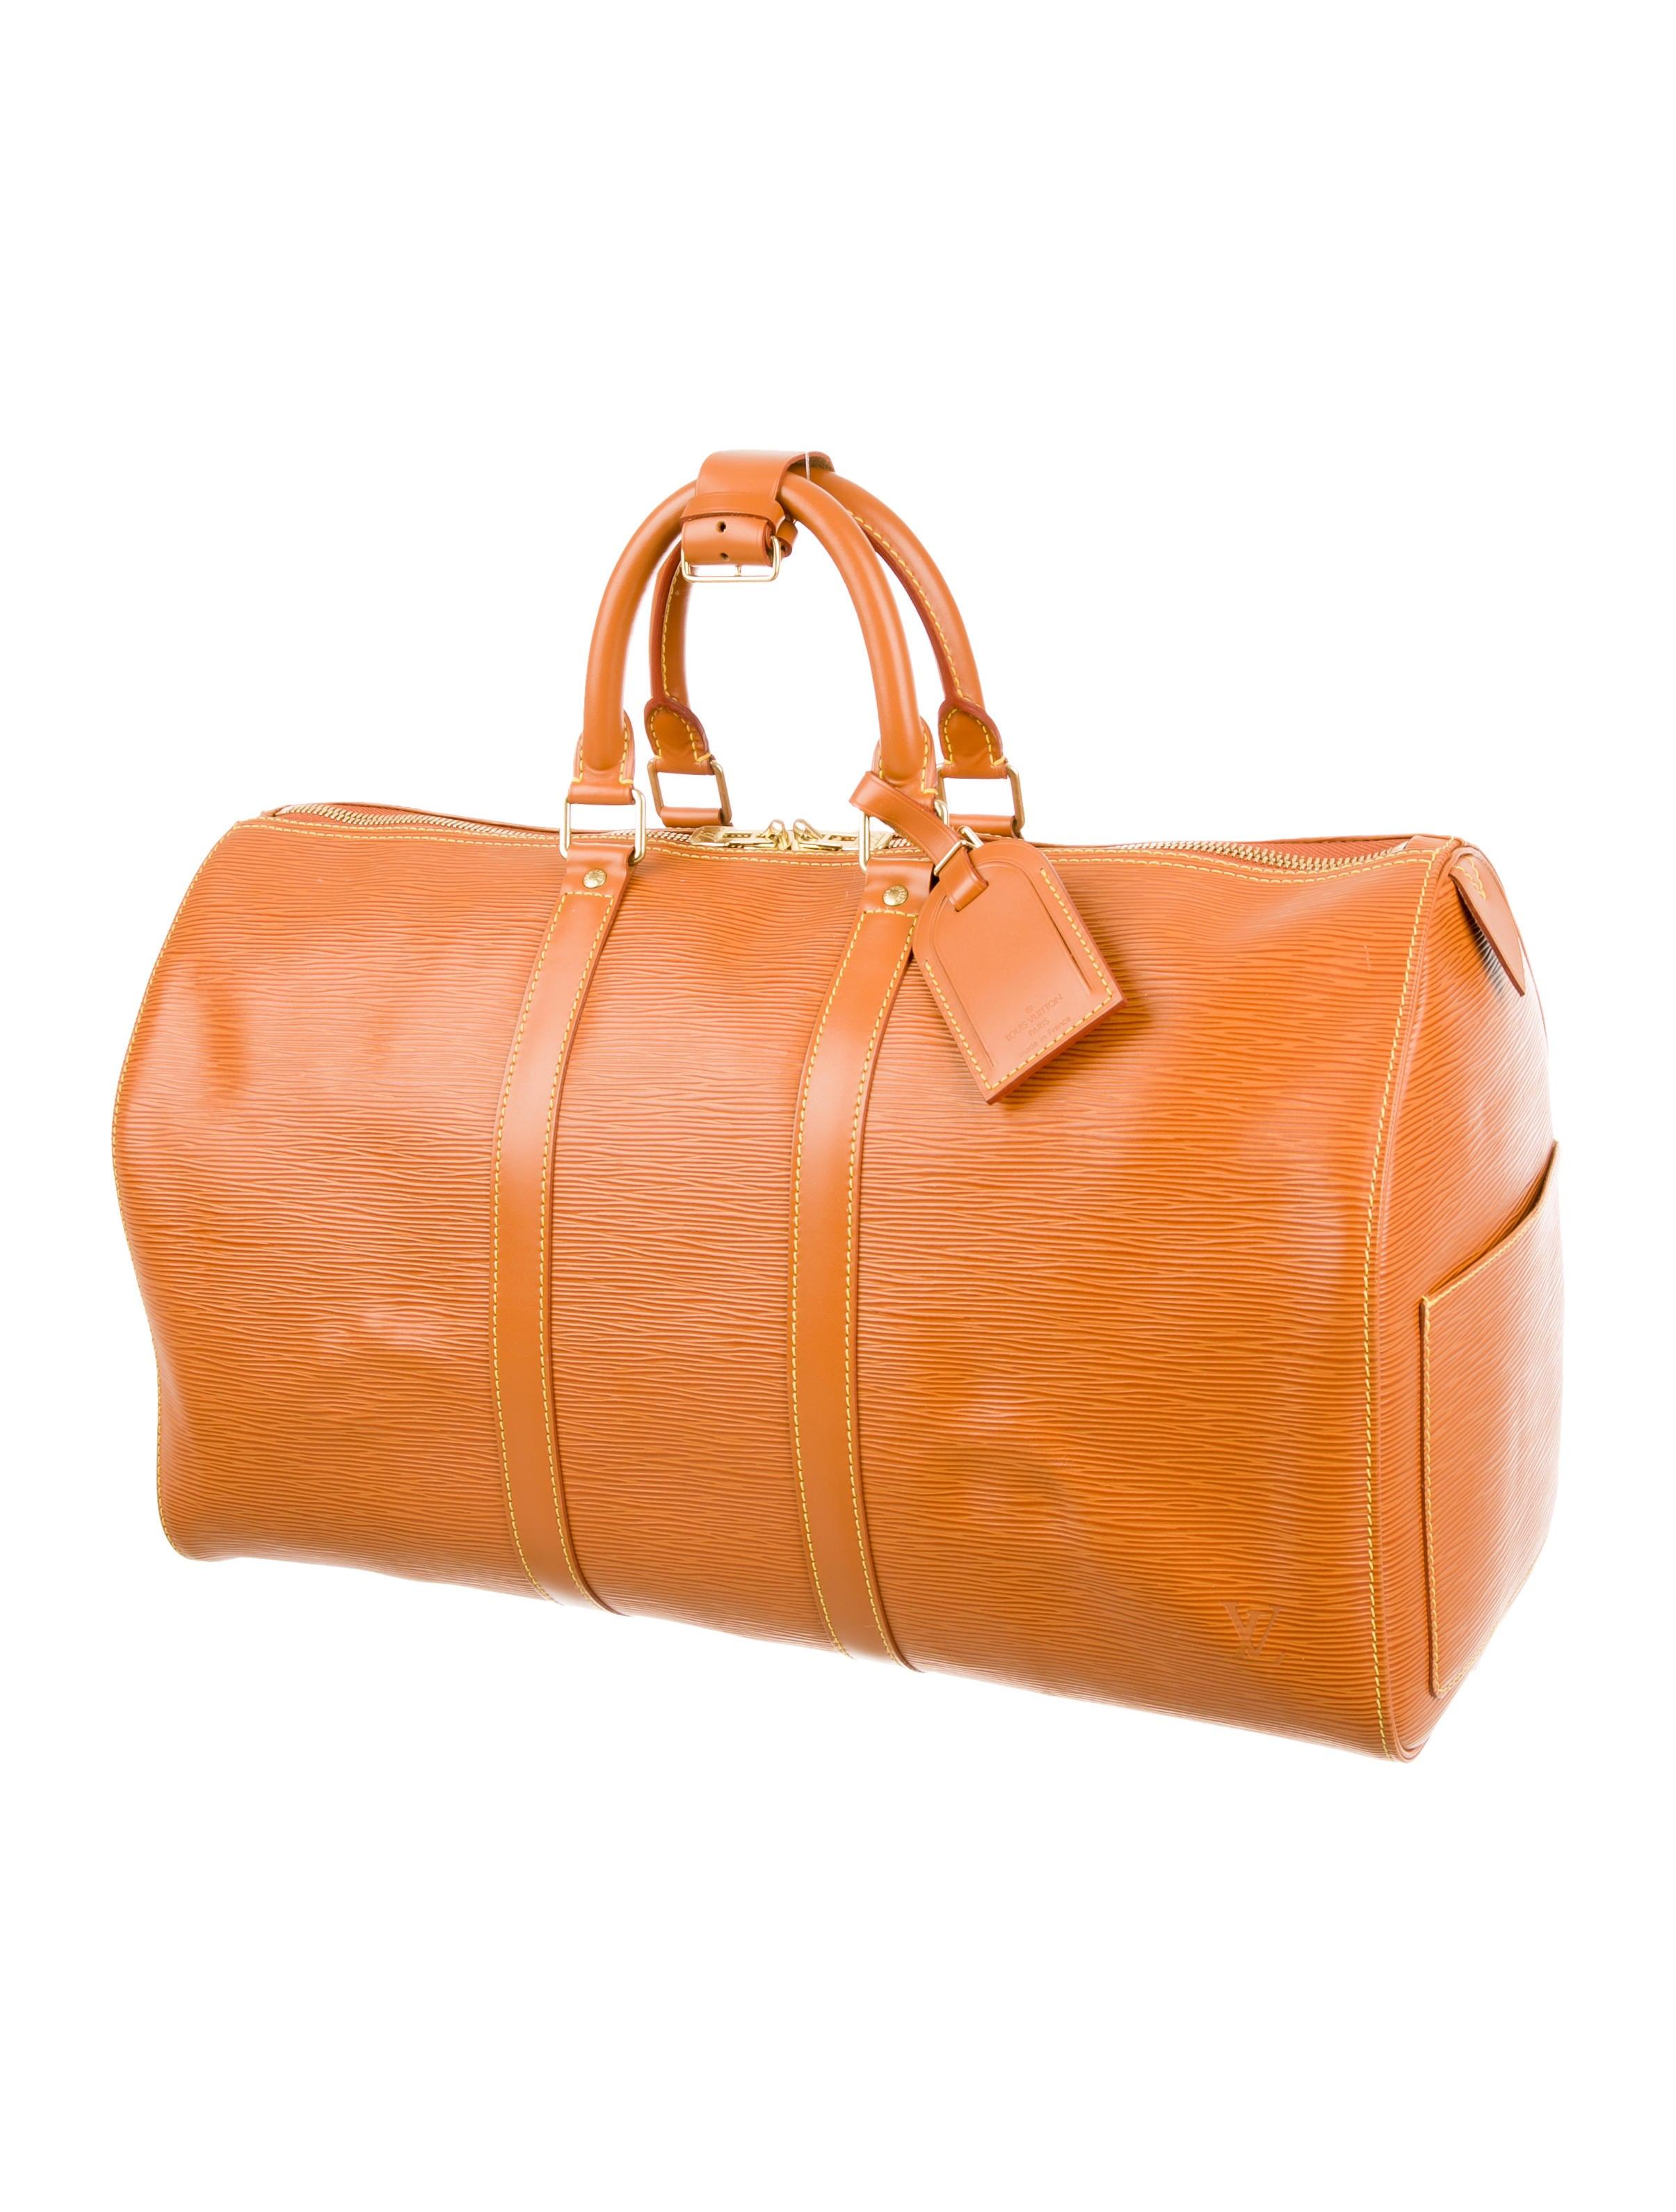 louis vuitton epi keepall 45 handbags lou108545 the. Black Bedroom Furniture Sets. Home Design Ideas